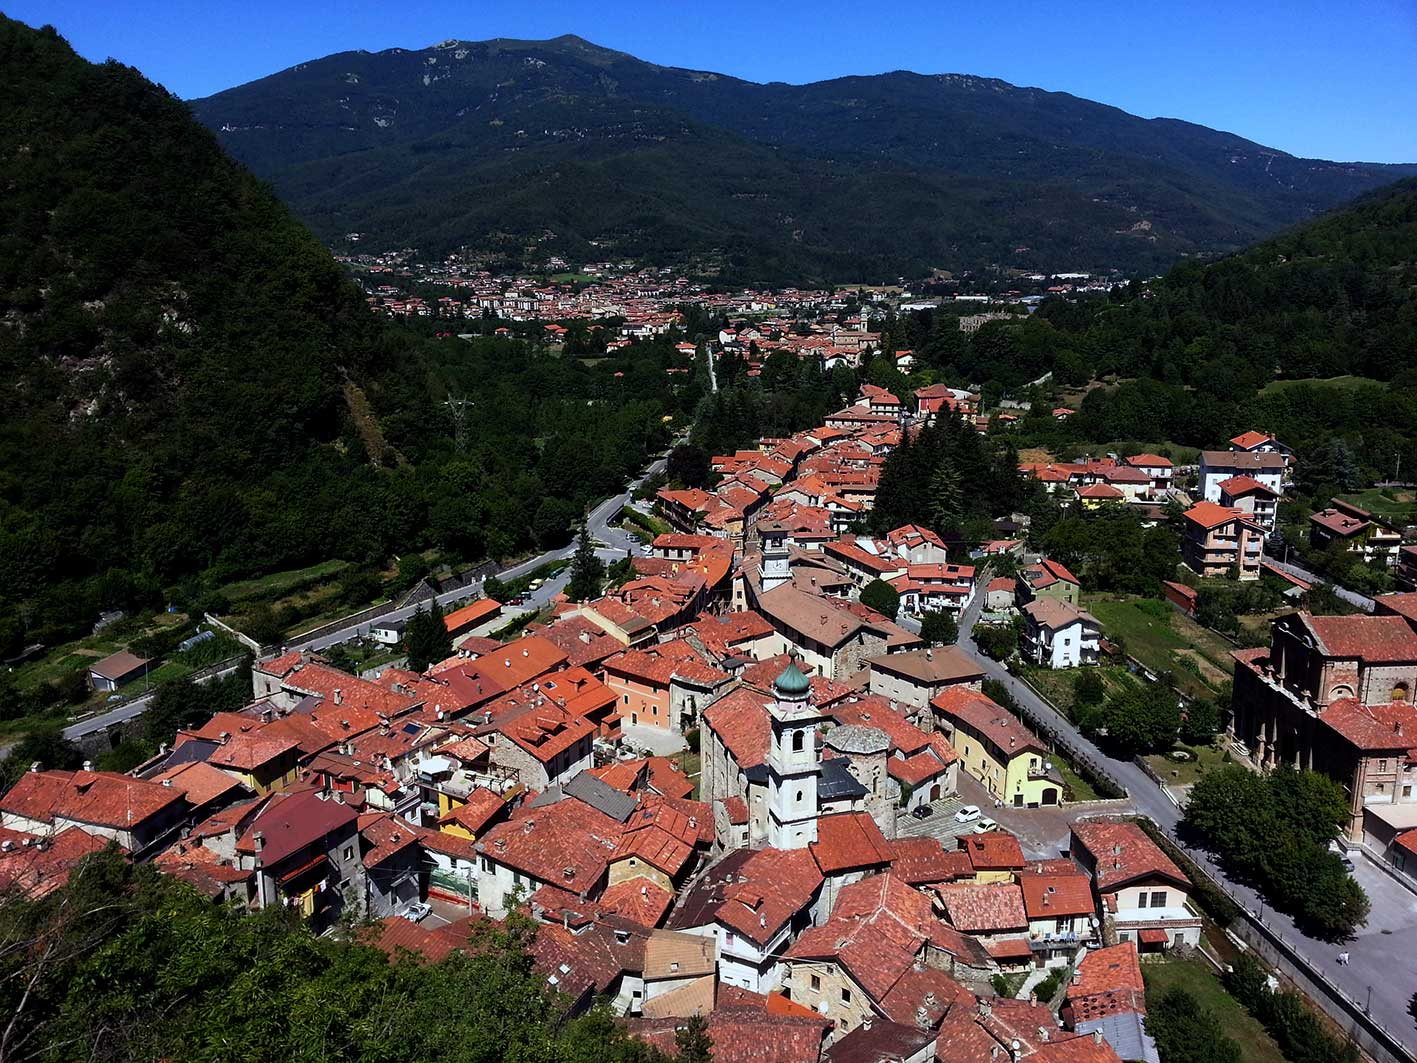 Garessio Borgo Antico